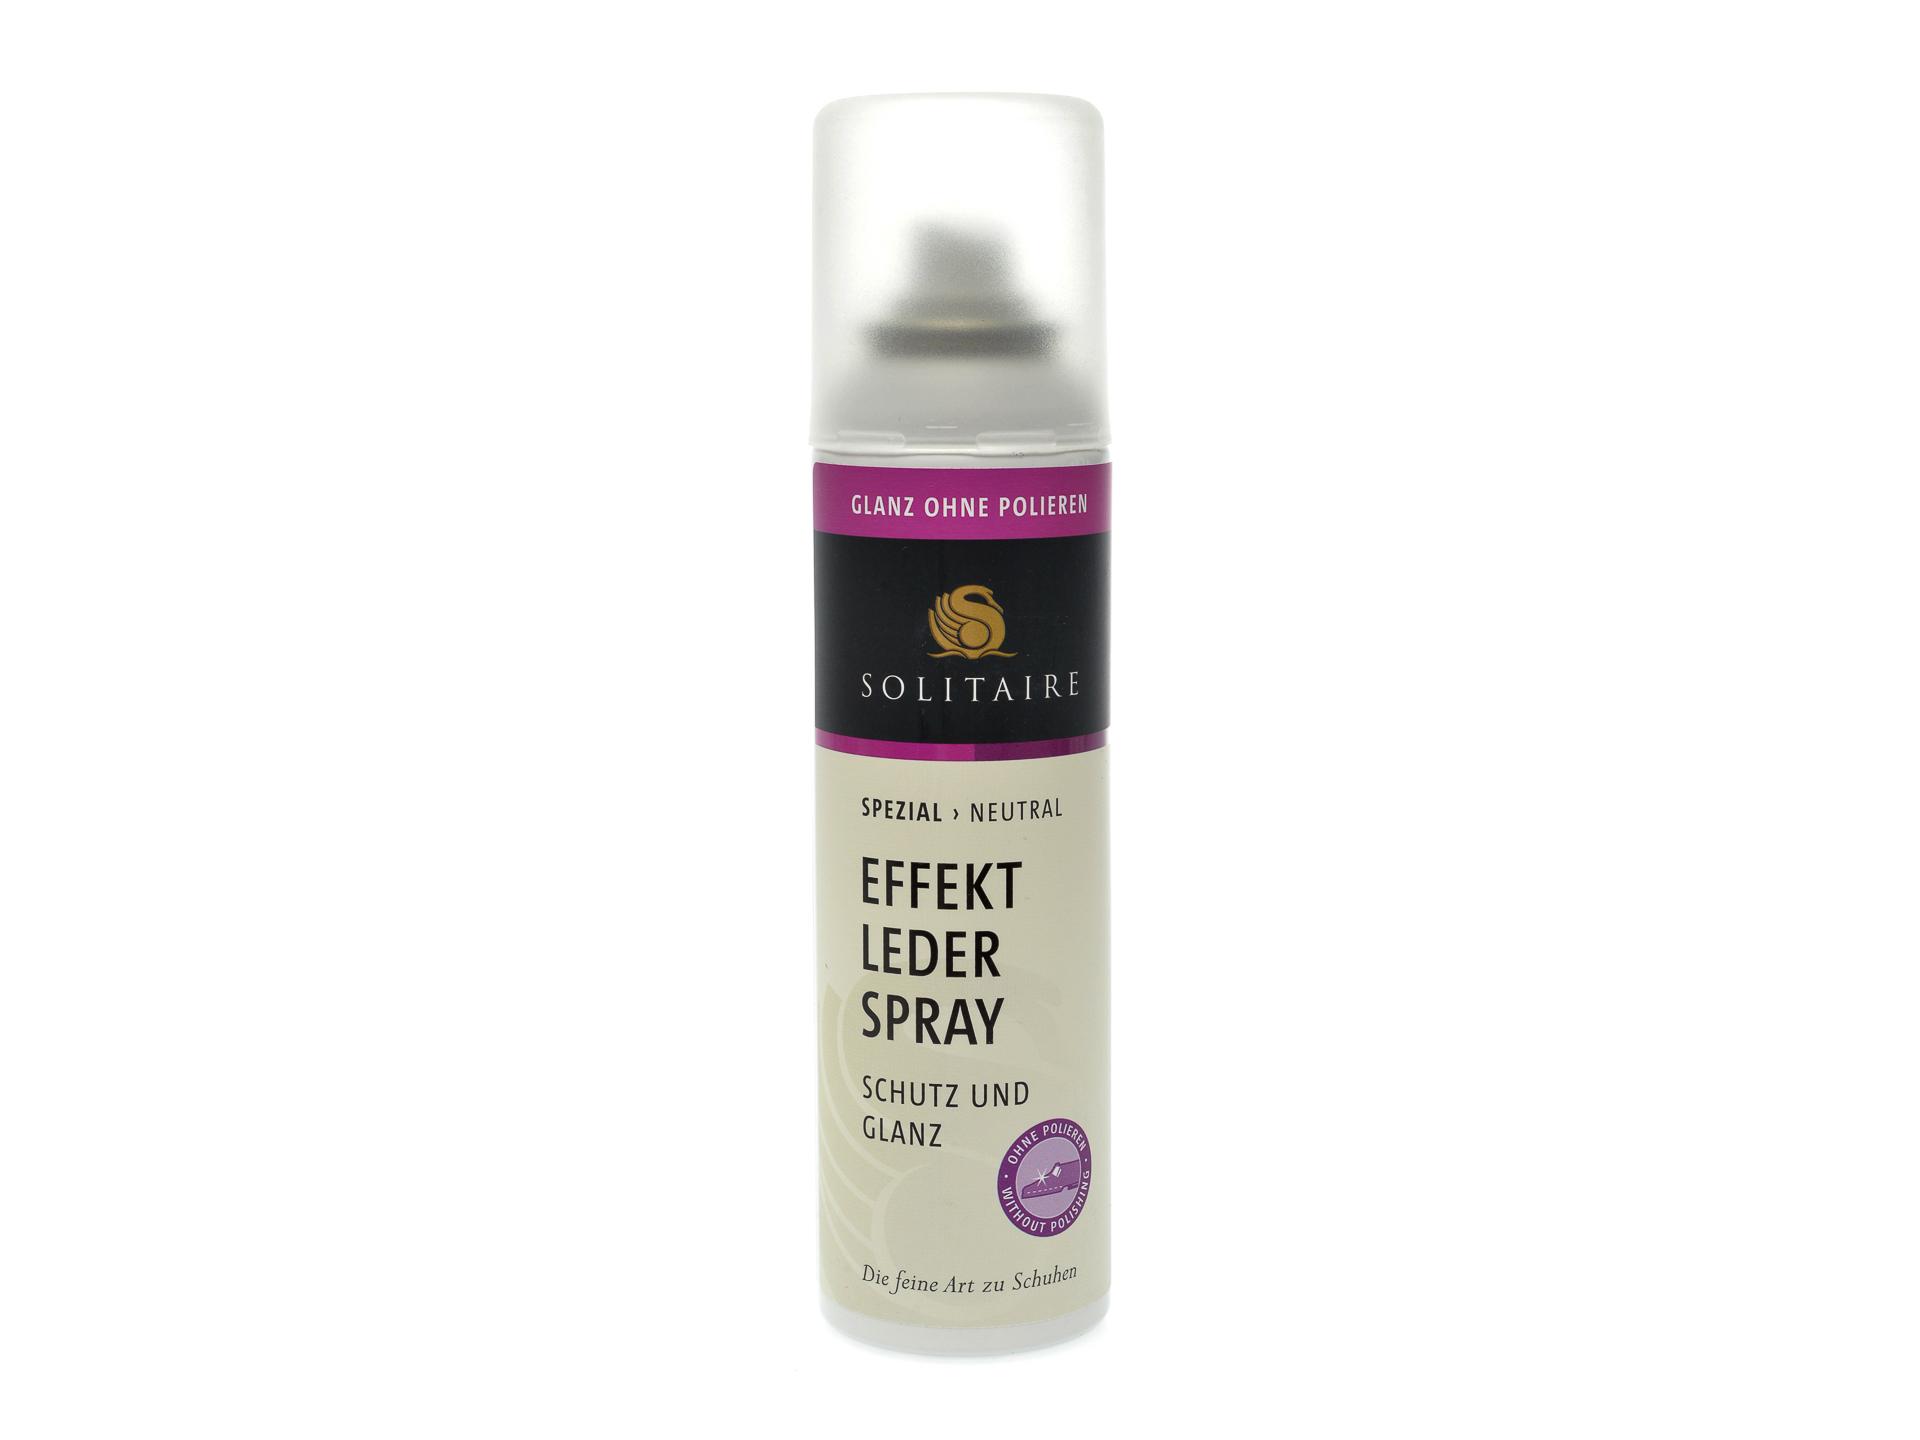 Spray pentru piele neteda cu efect vintage, Solitaire imagine otter.ro 2021